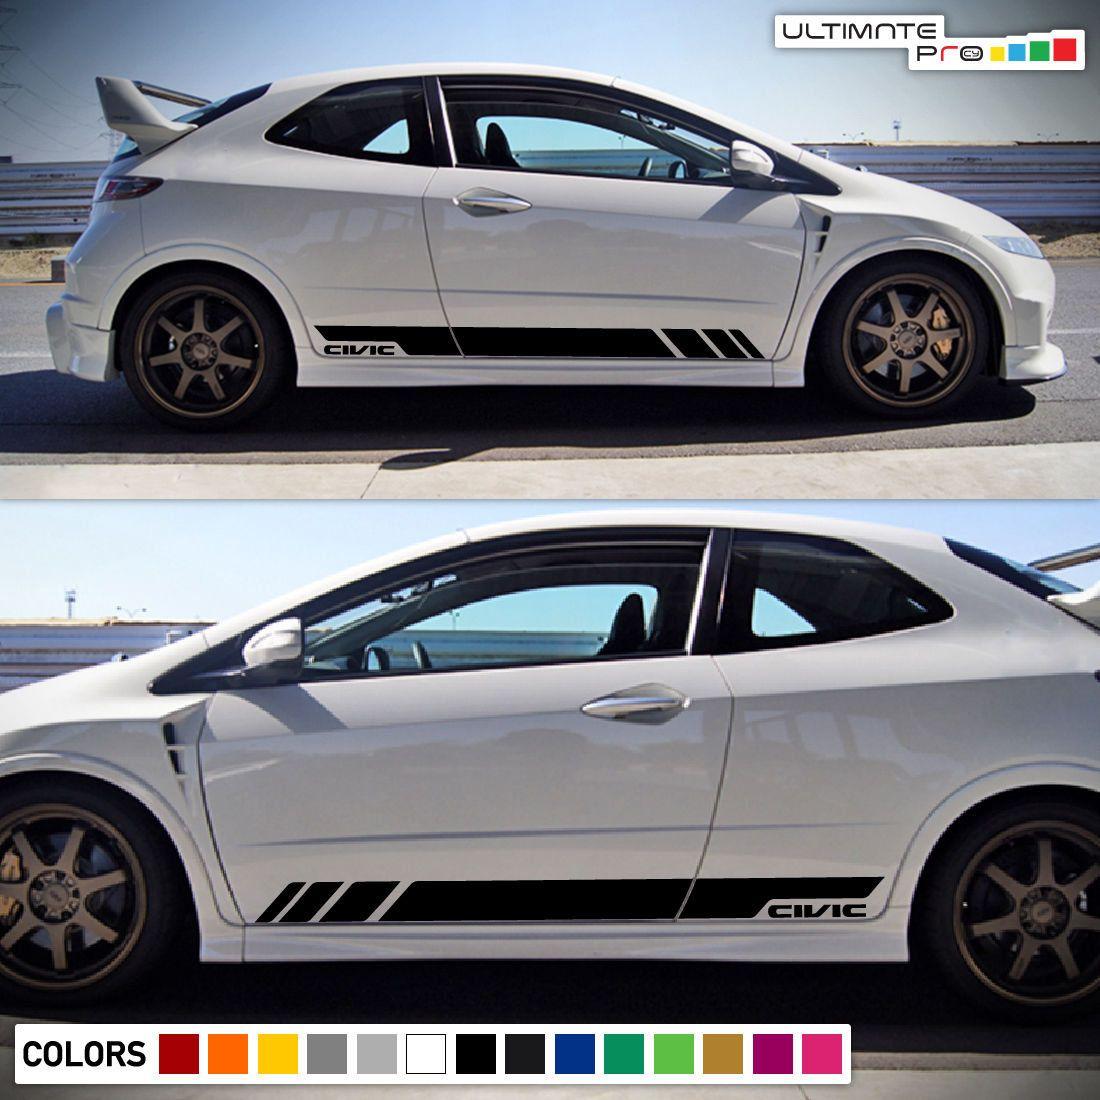 Sticker Decal Vinyl Side Door Stripes For Honda Civic Fn2 Sport Wing Type R Honda Civic Vinyl Siding Honda [ 1100 x 1100 Pixel ]